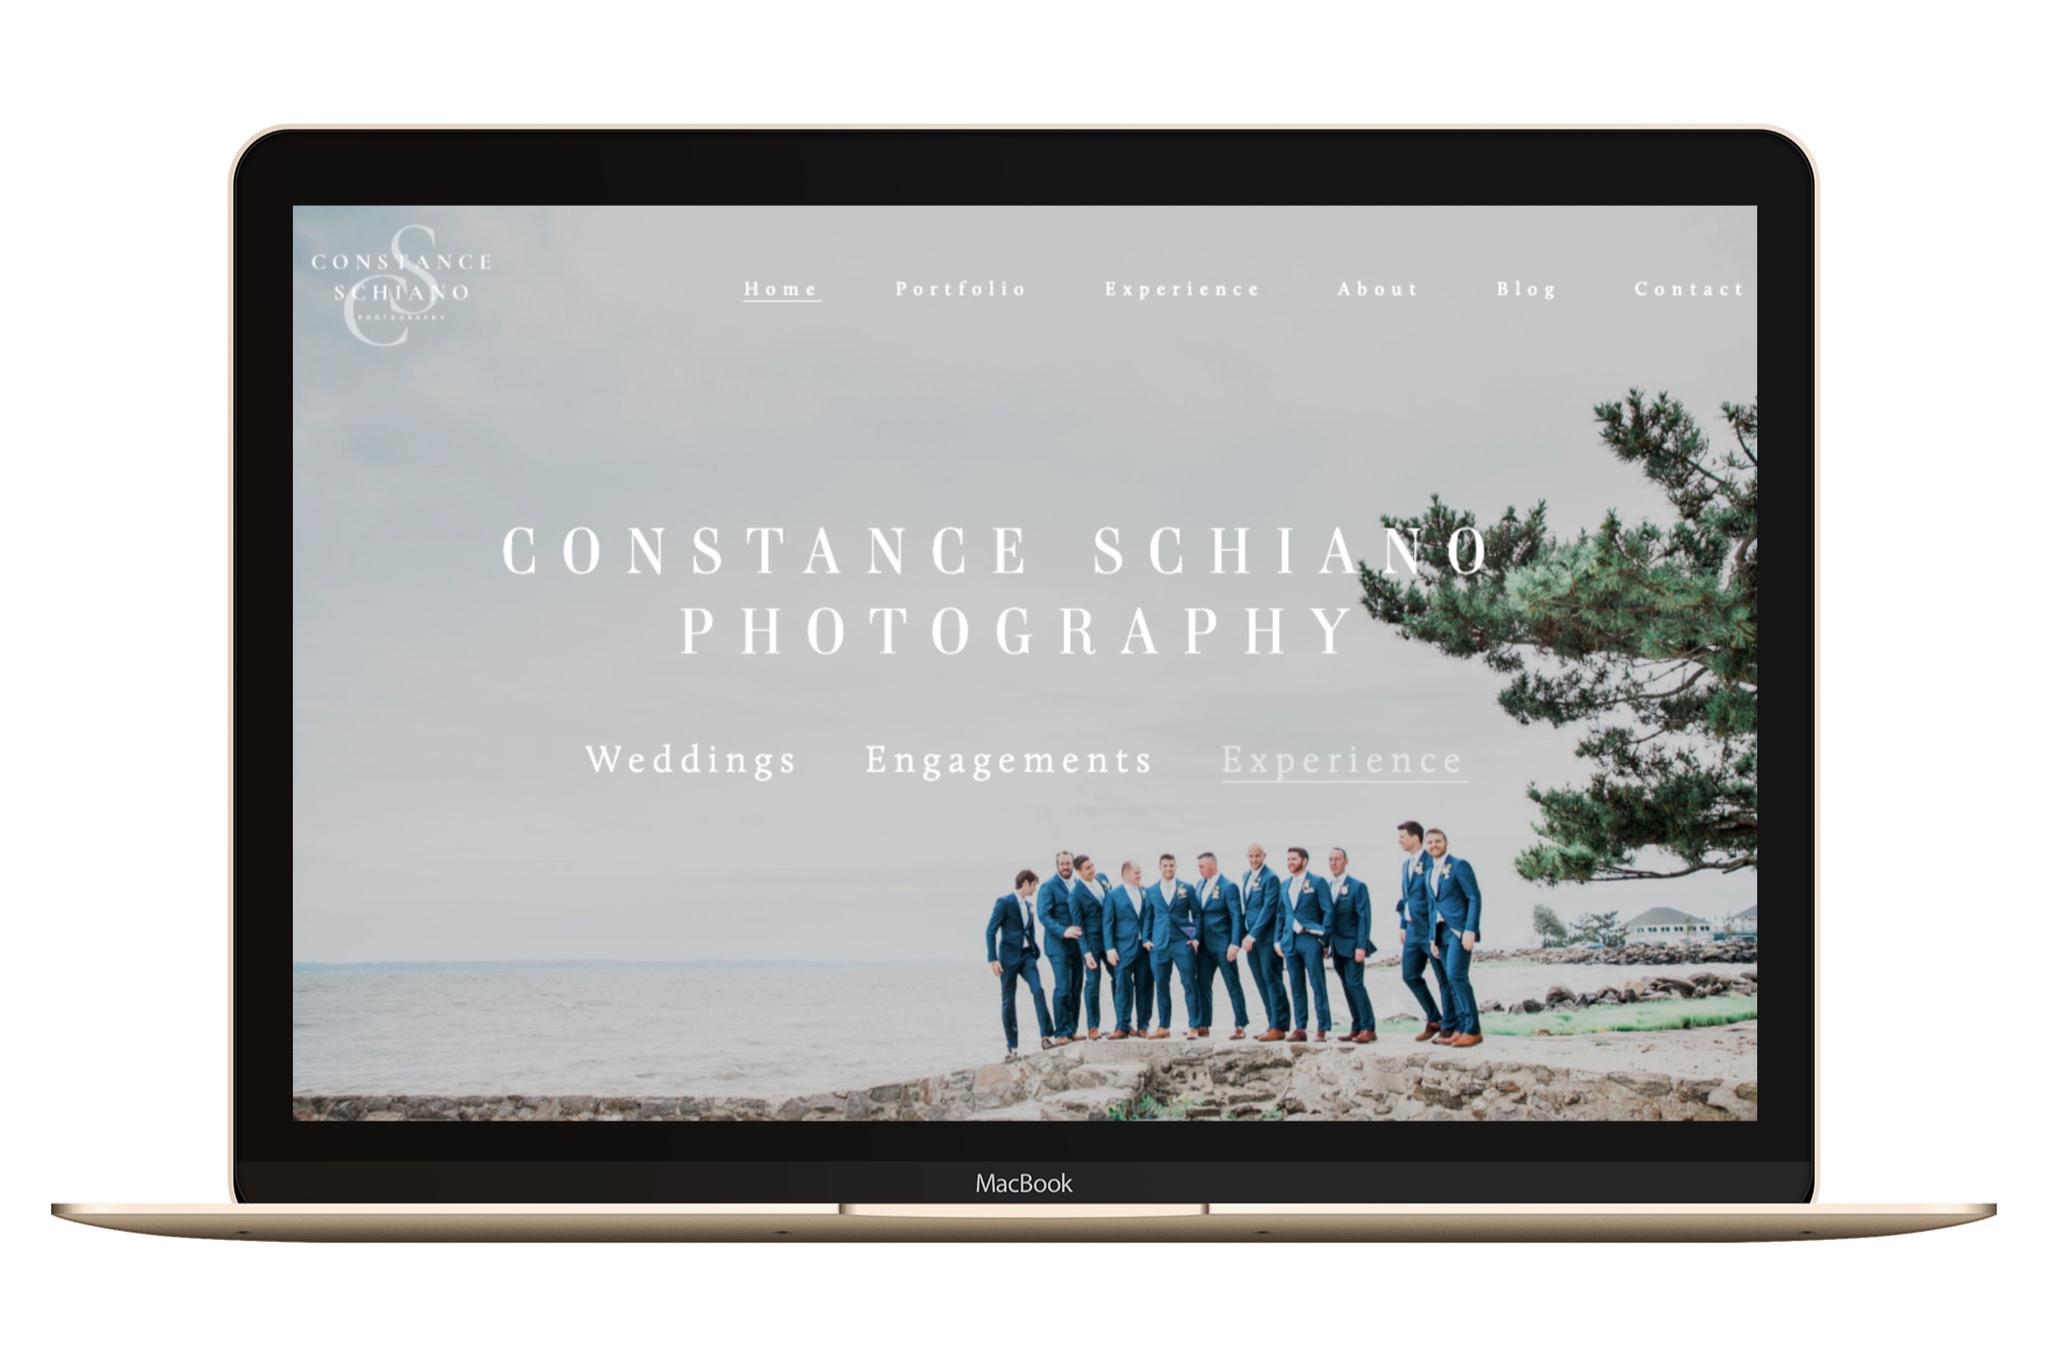 constance+schiano+squarespace+website+designer+Freya+Rose+Tanner.jpg